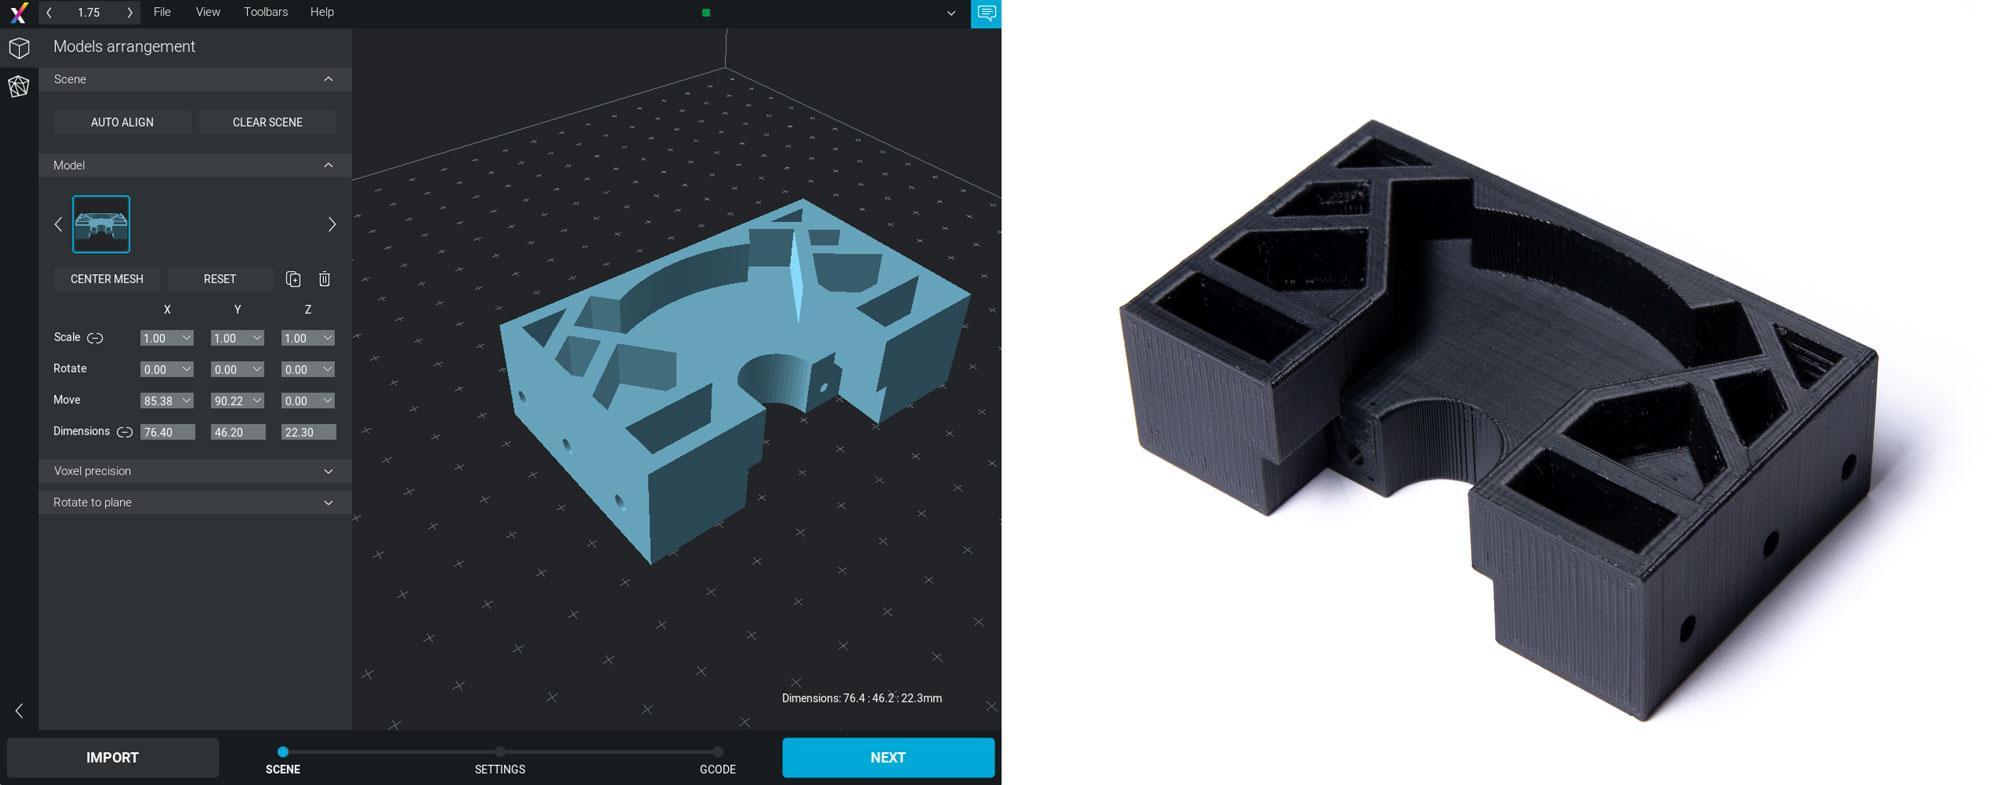 3D render and printed model